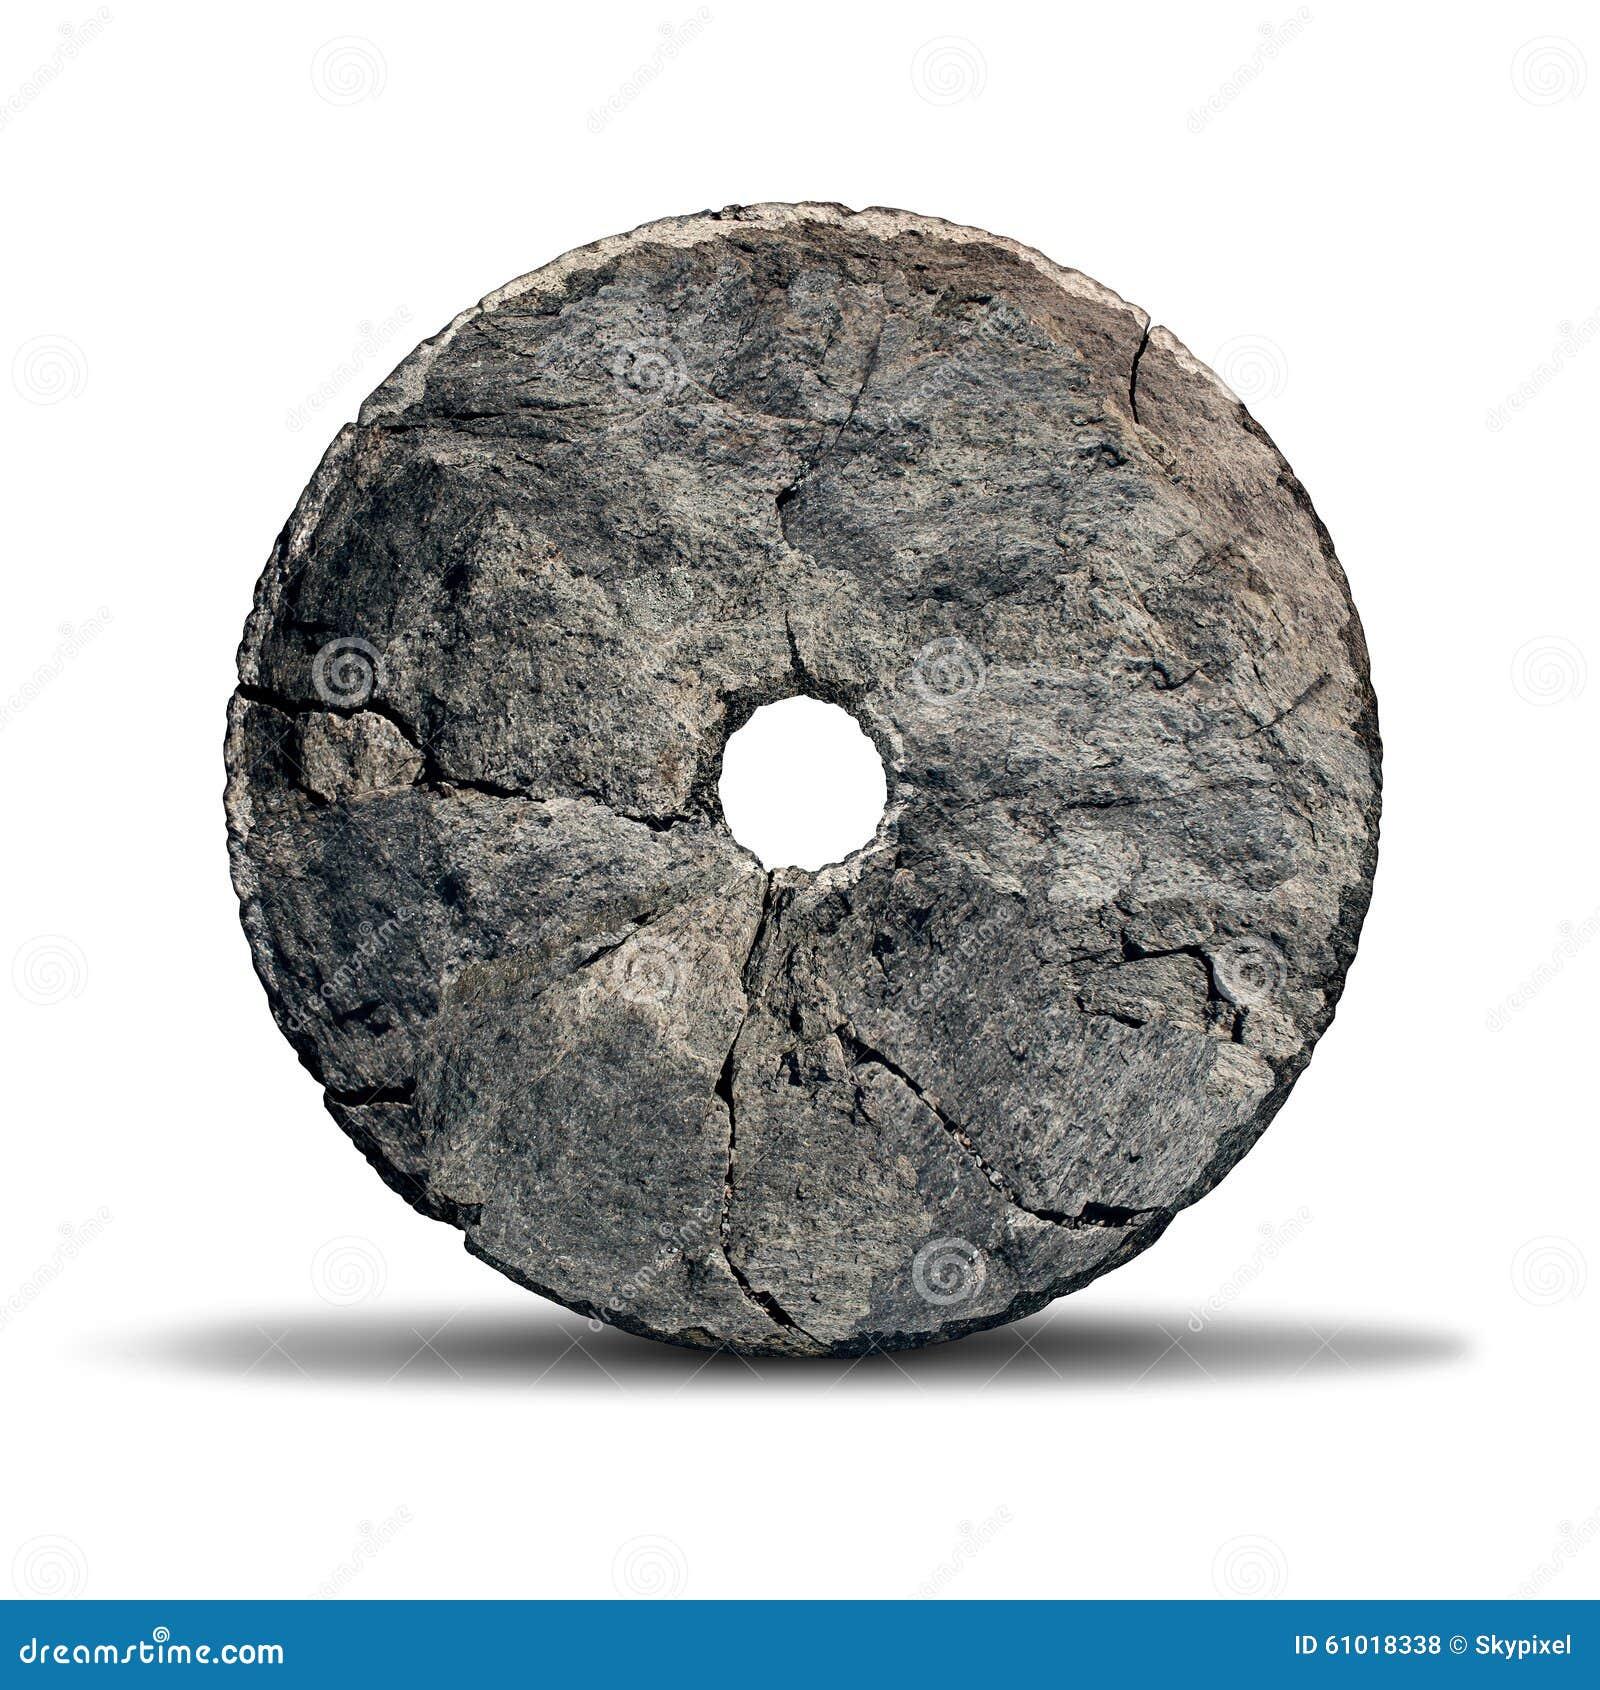 Caveman Wheel : Stone wheel stock illustration image